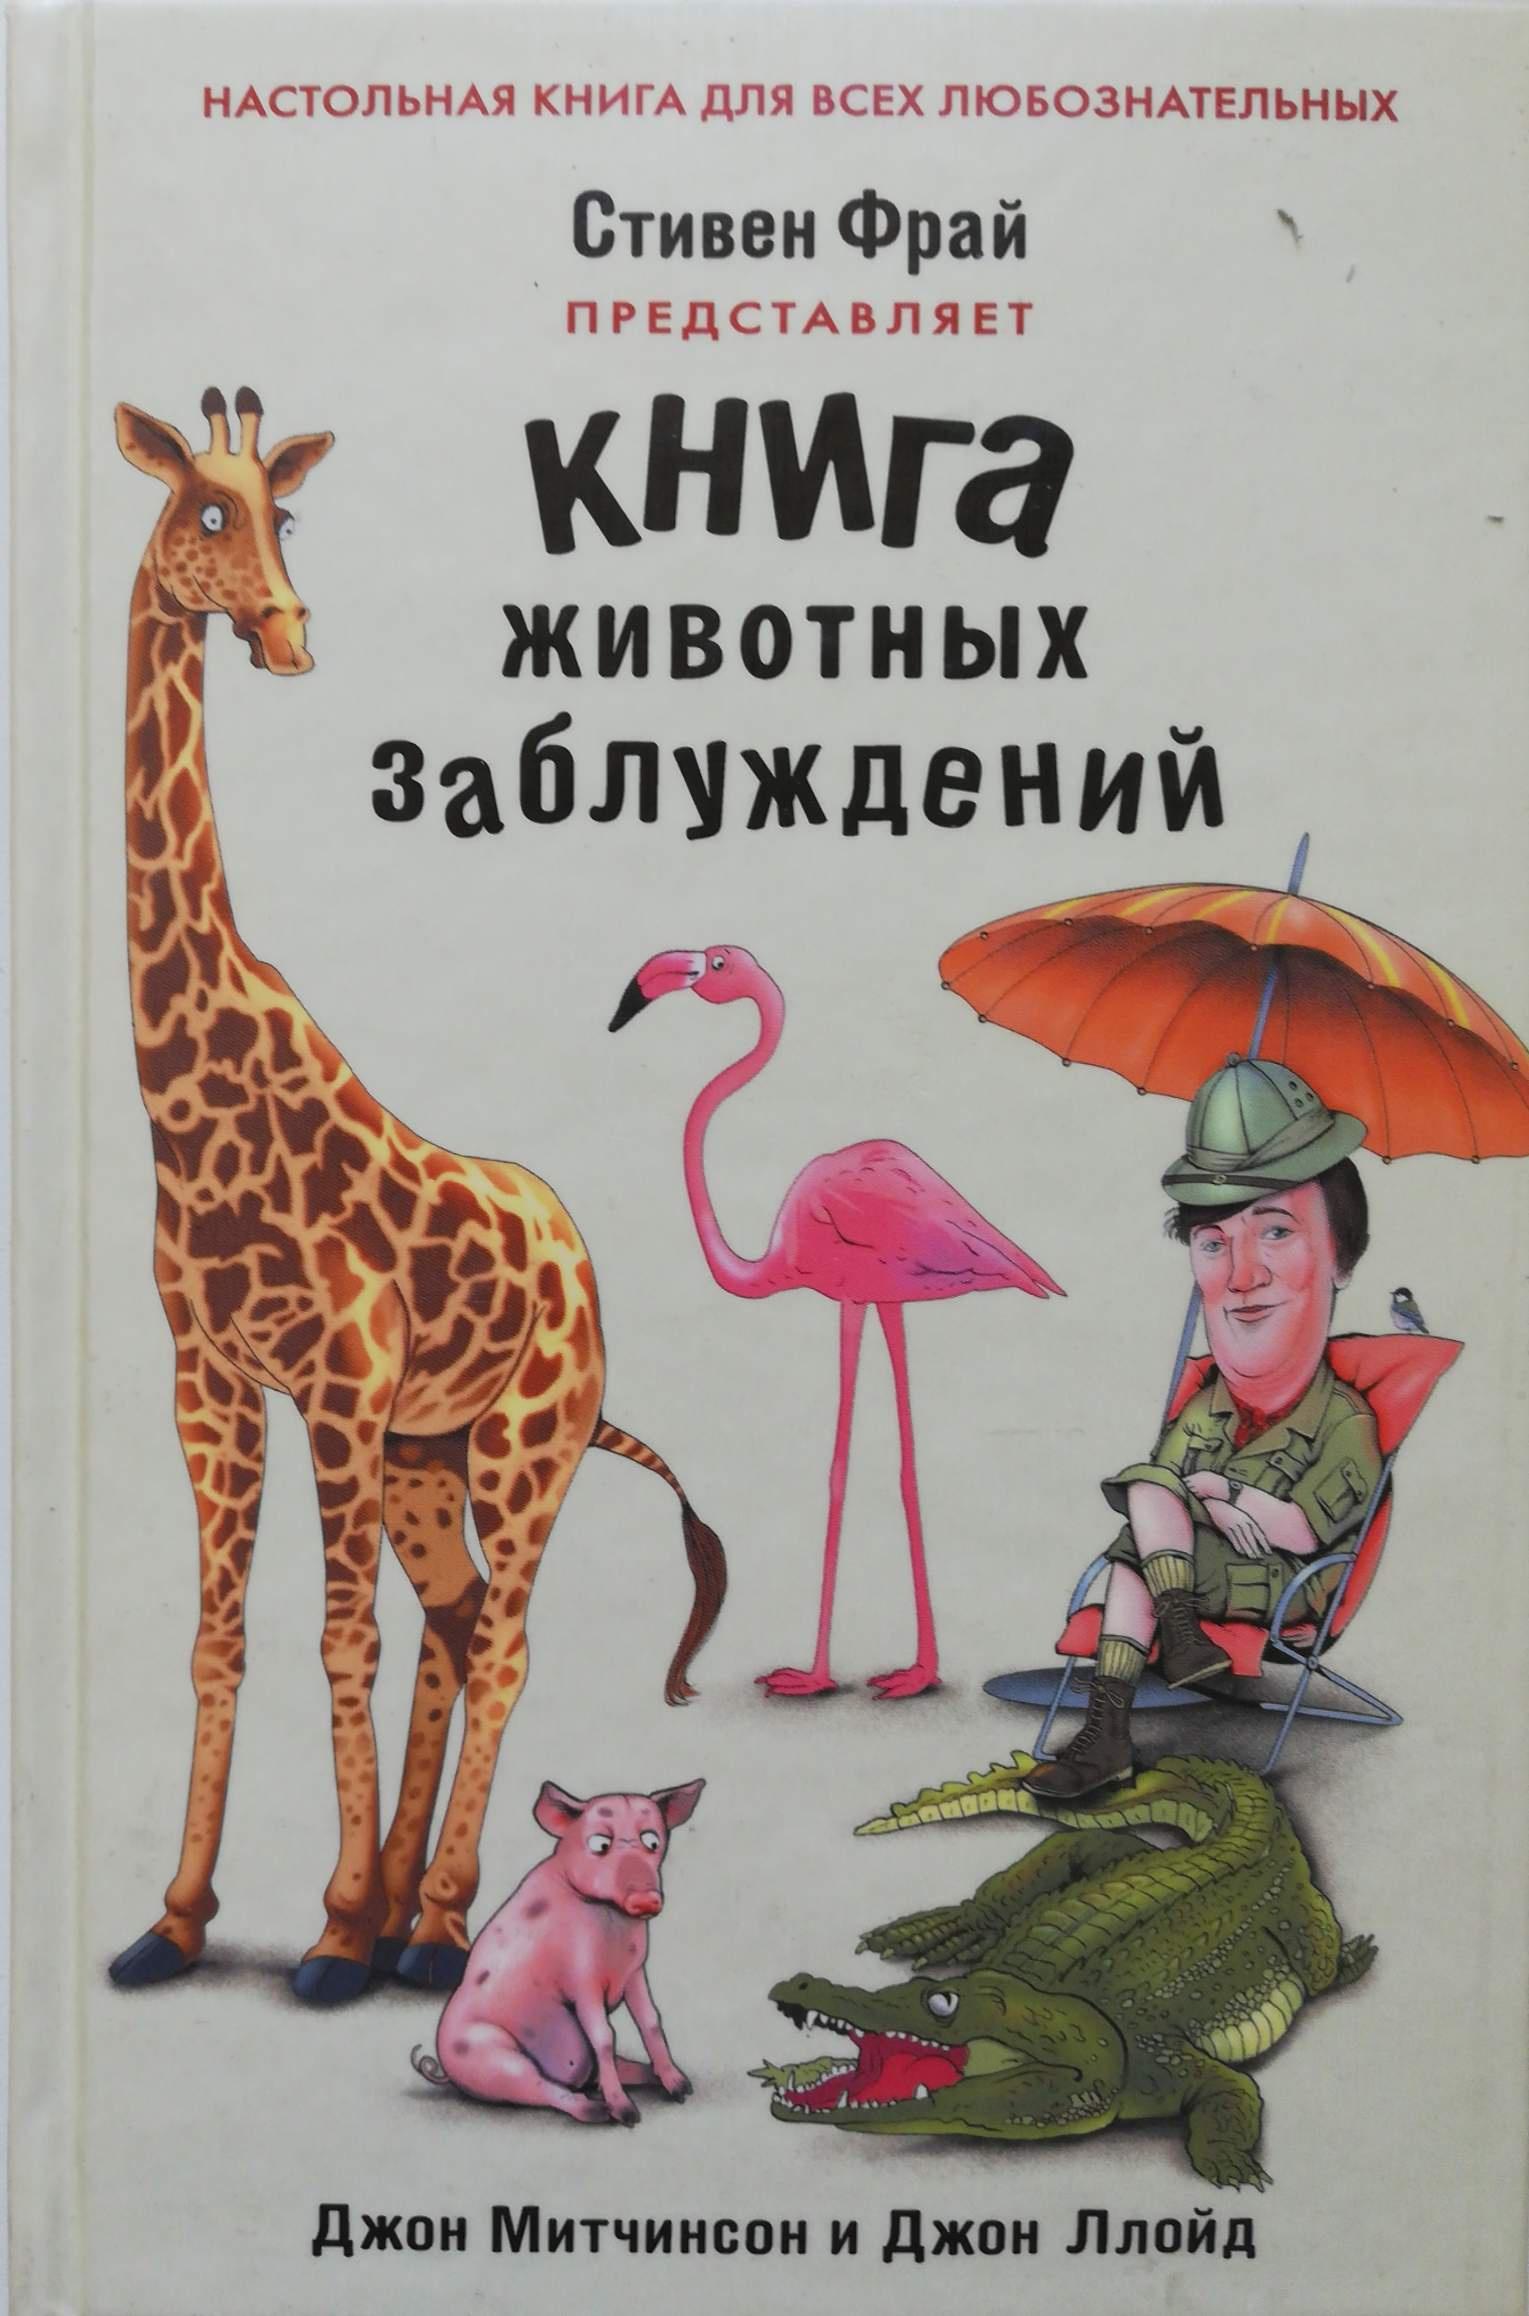 Ллойд Джон, Митчисон Джон Книга животных заблуждений